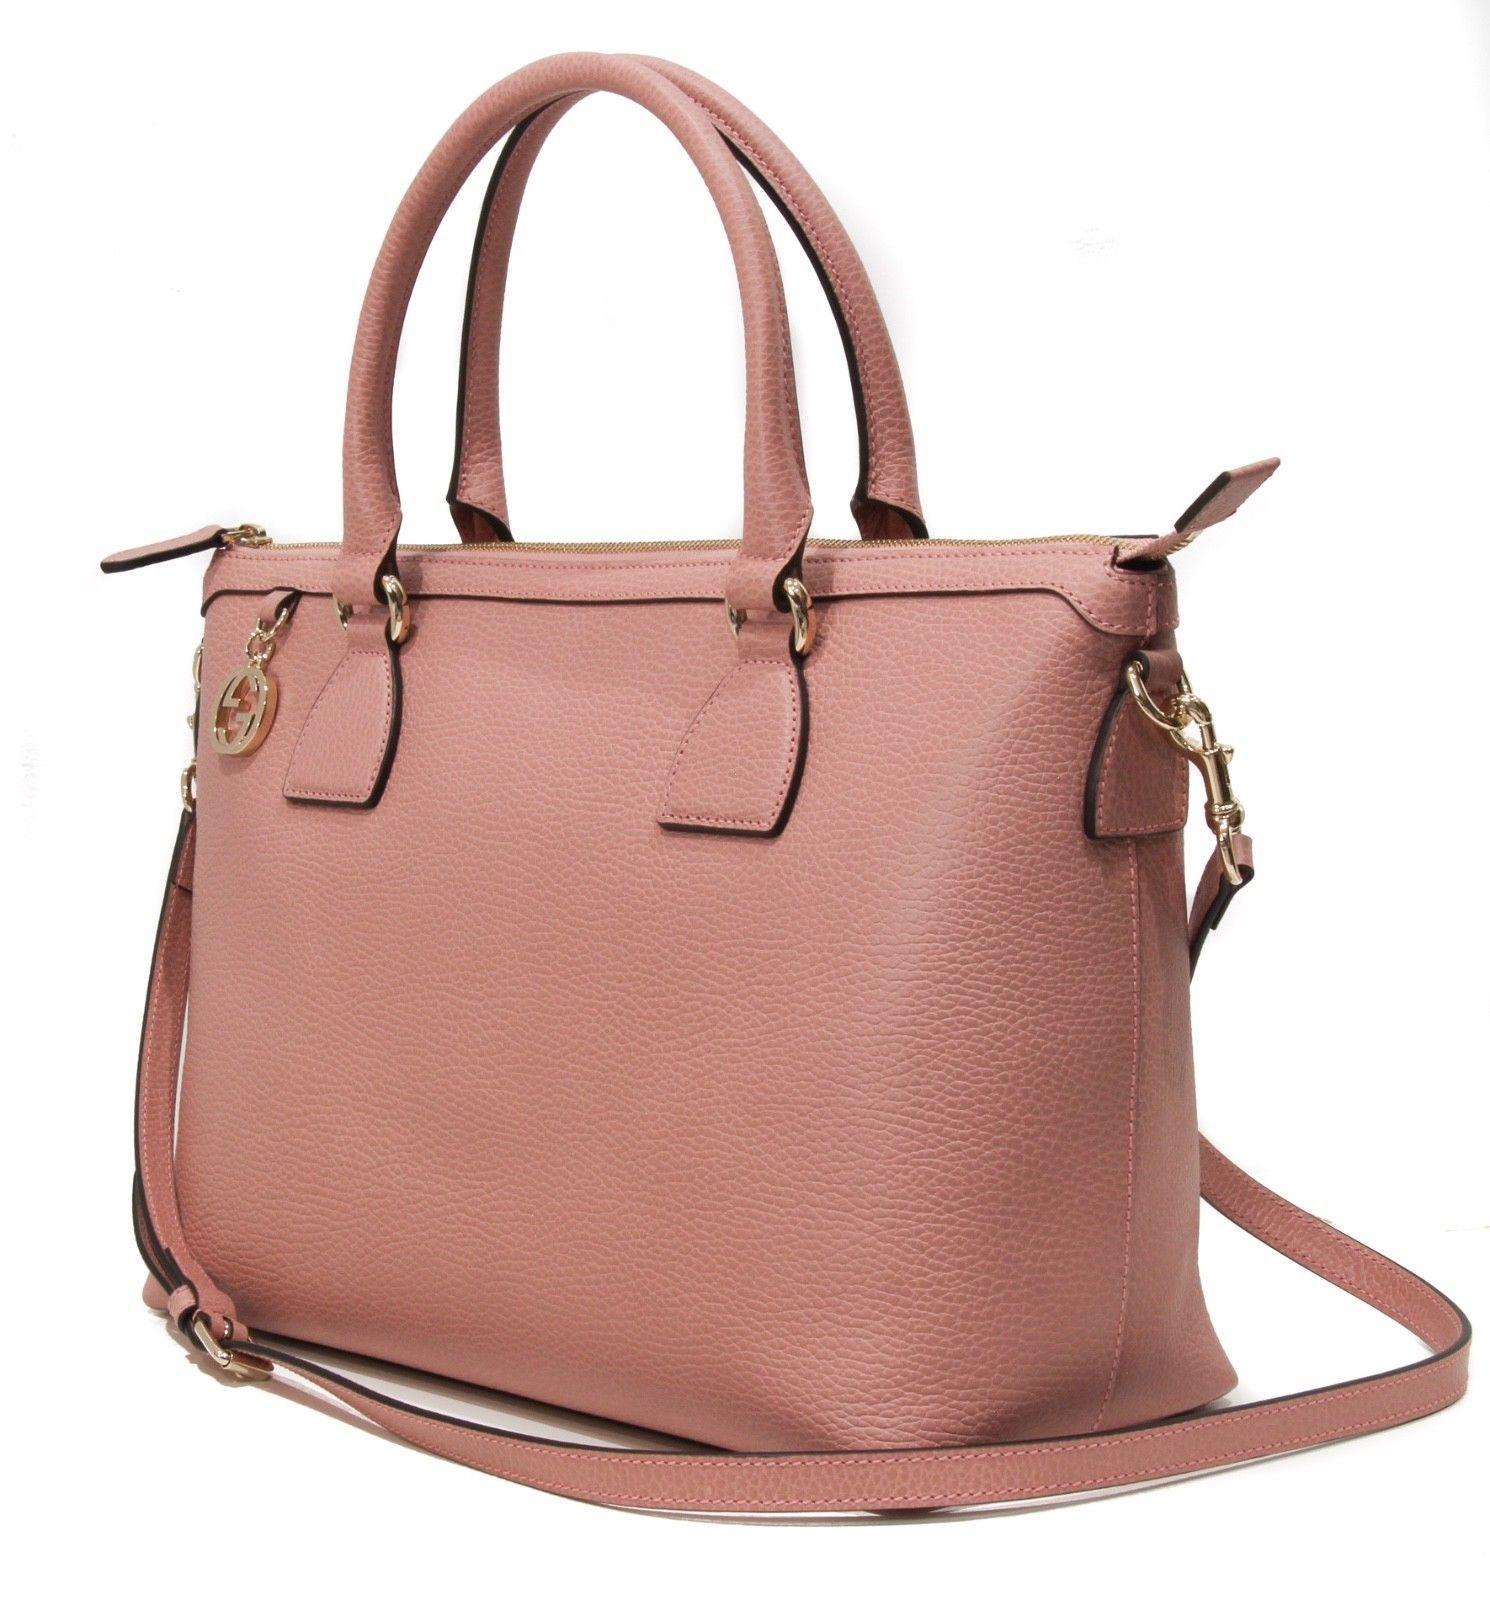 1297f795ea1 GUCCI 449650 Leather Soft Pink w Interlocking G Charm and Shoulder Strap  handbag